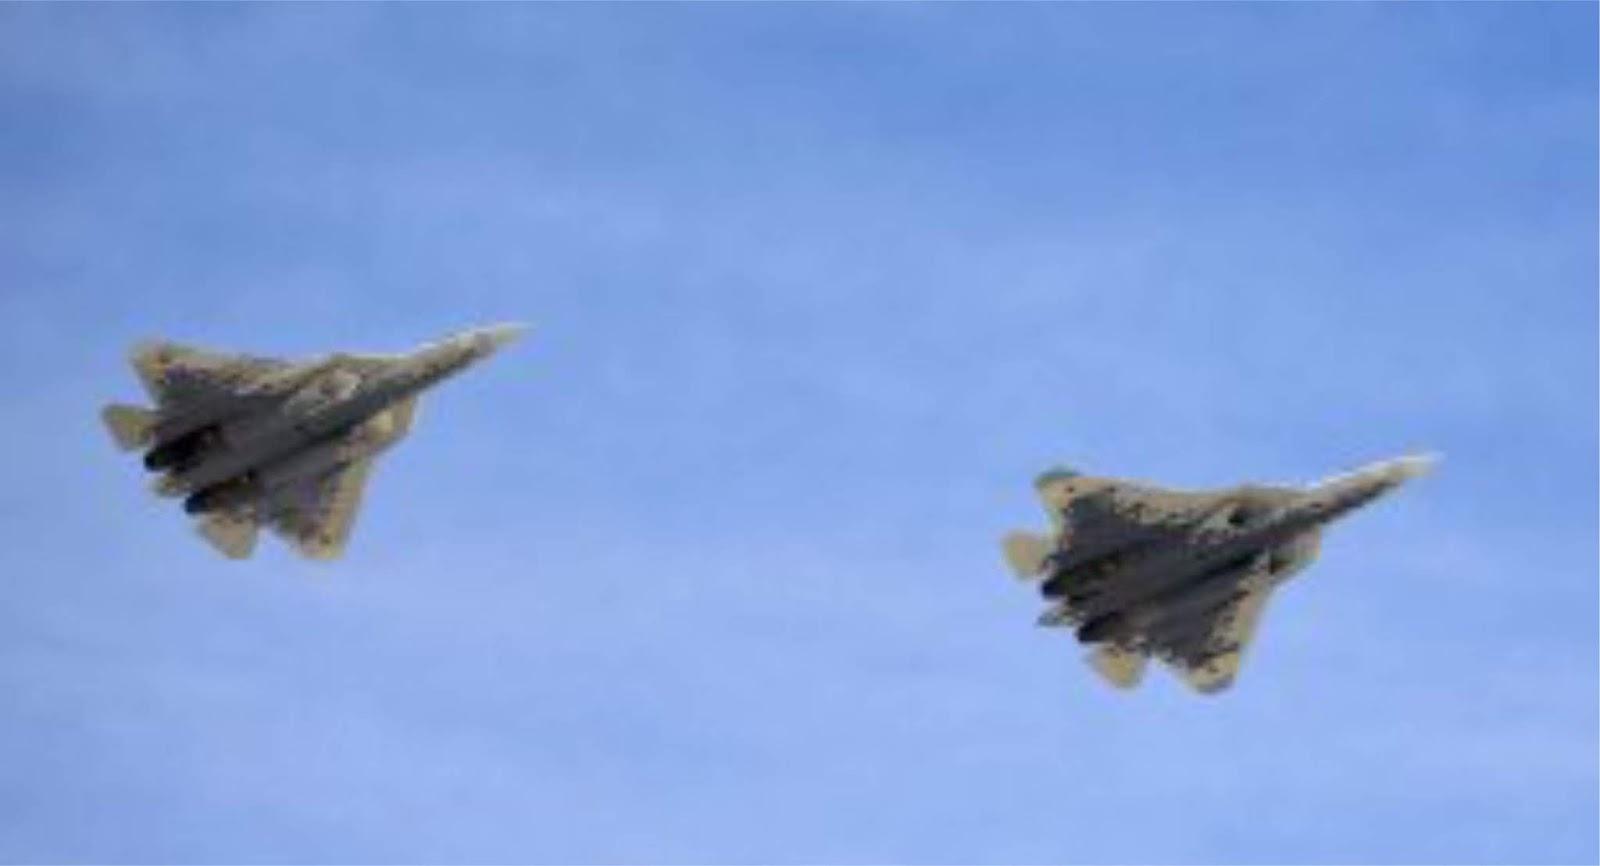 Kecerdasan buatan akan memperluas kemampuan pesawat tempur Su-57